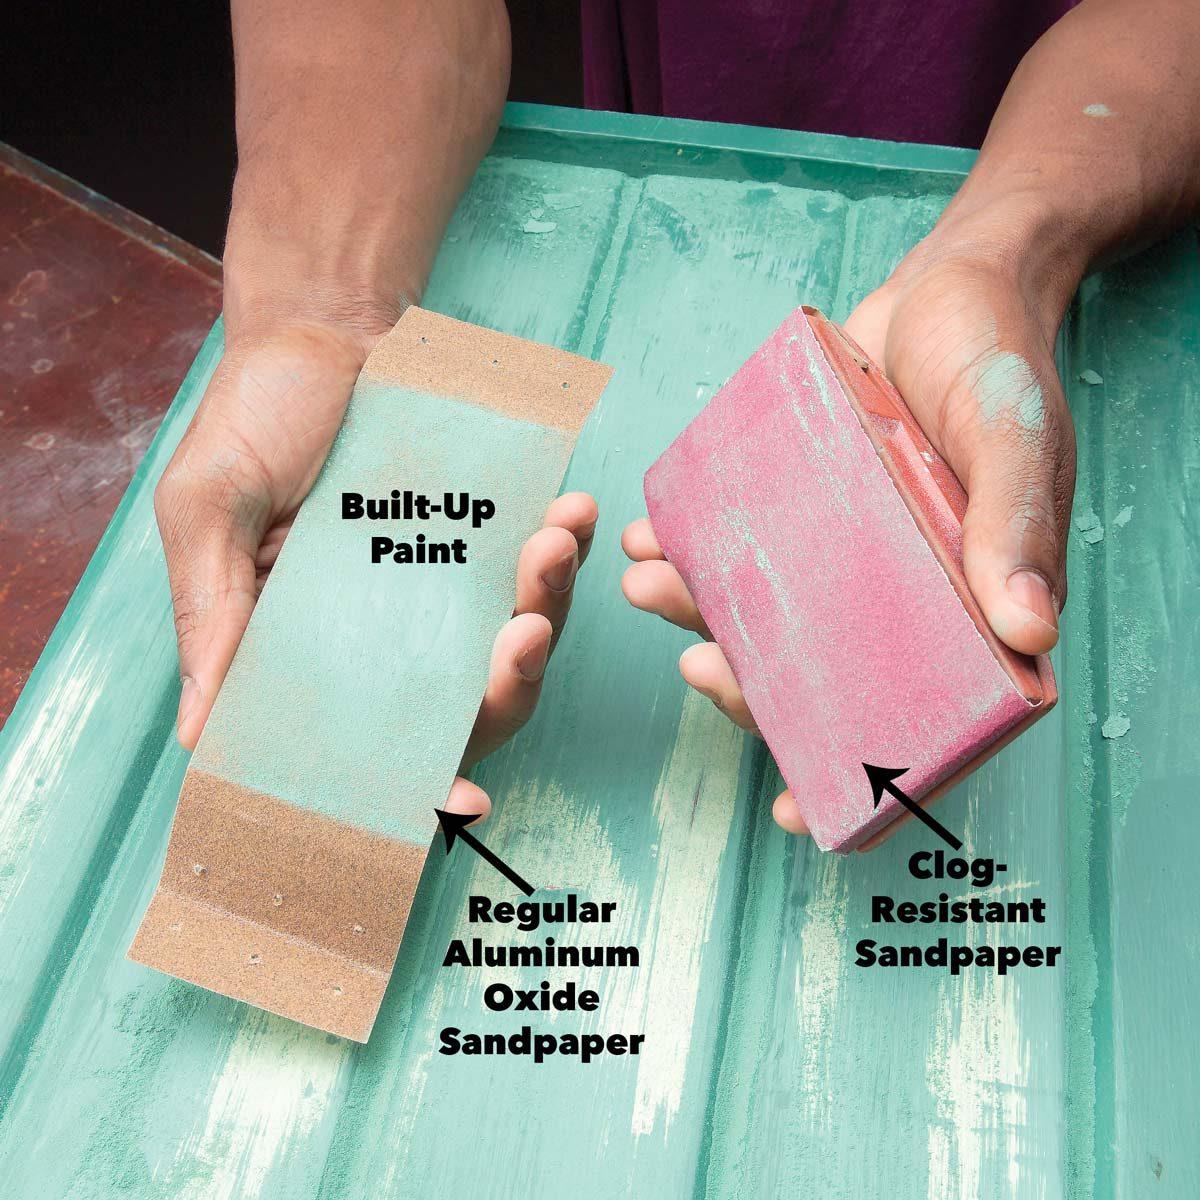 Clog resistant sandpaper